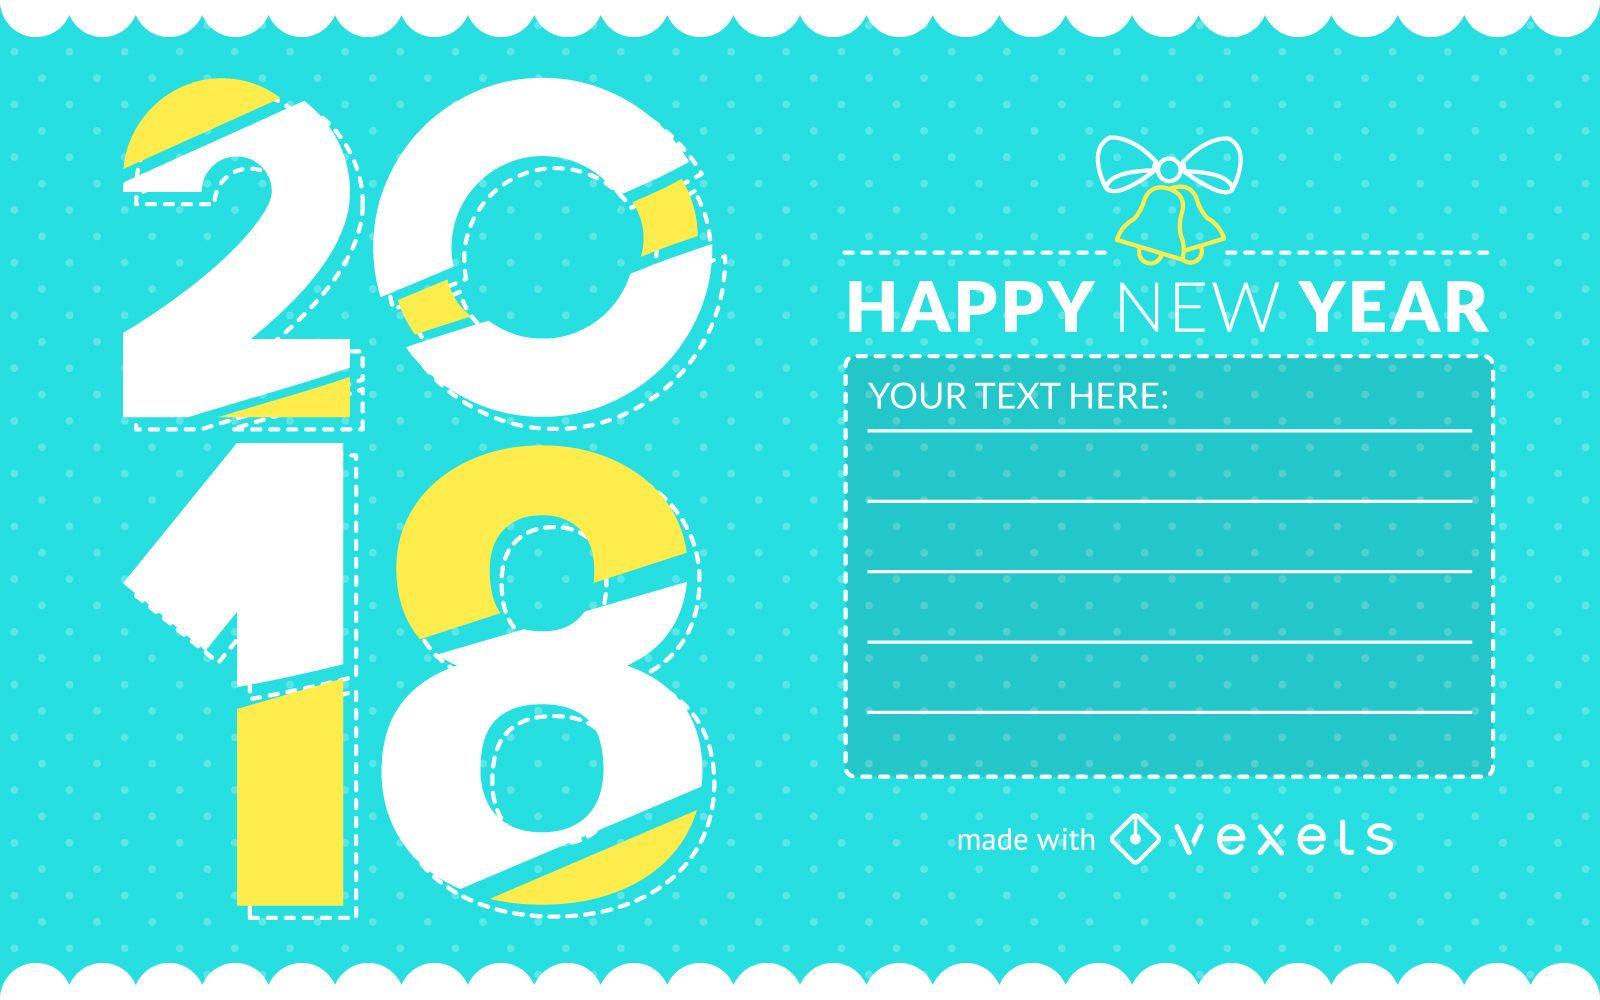 2018 New Year greeting card creator - Editable design